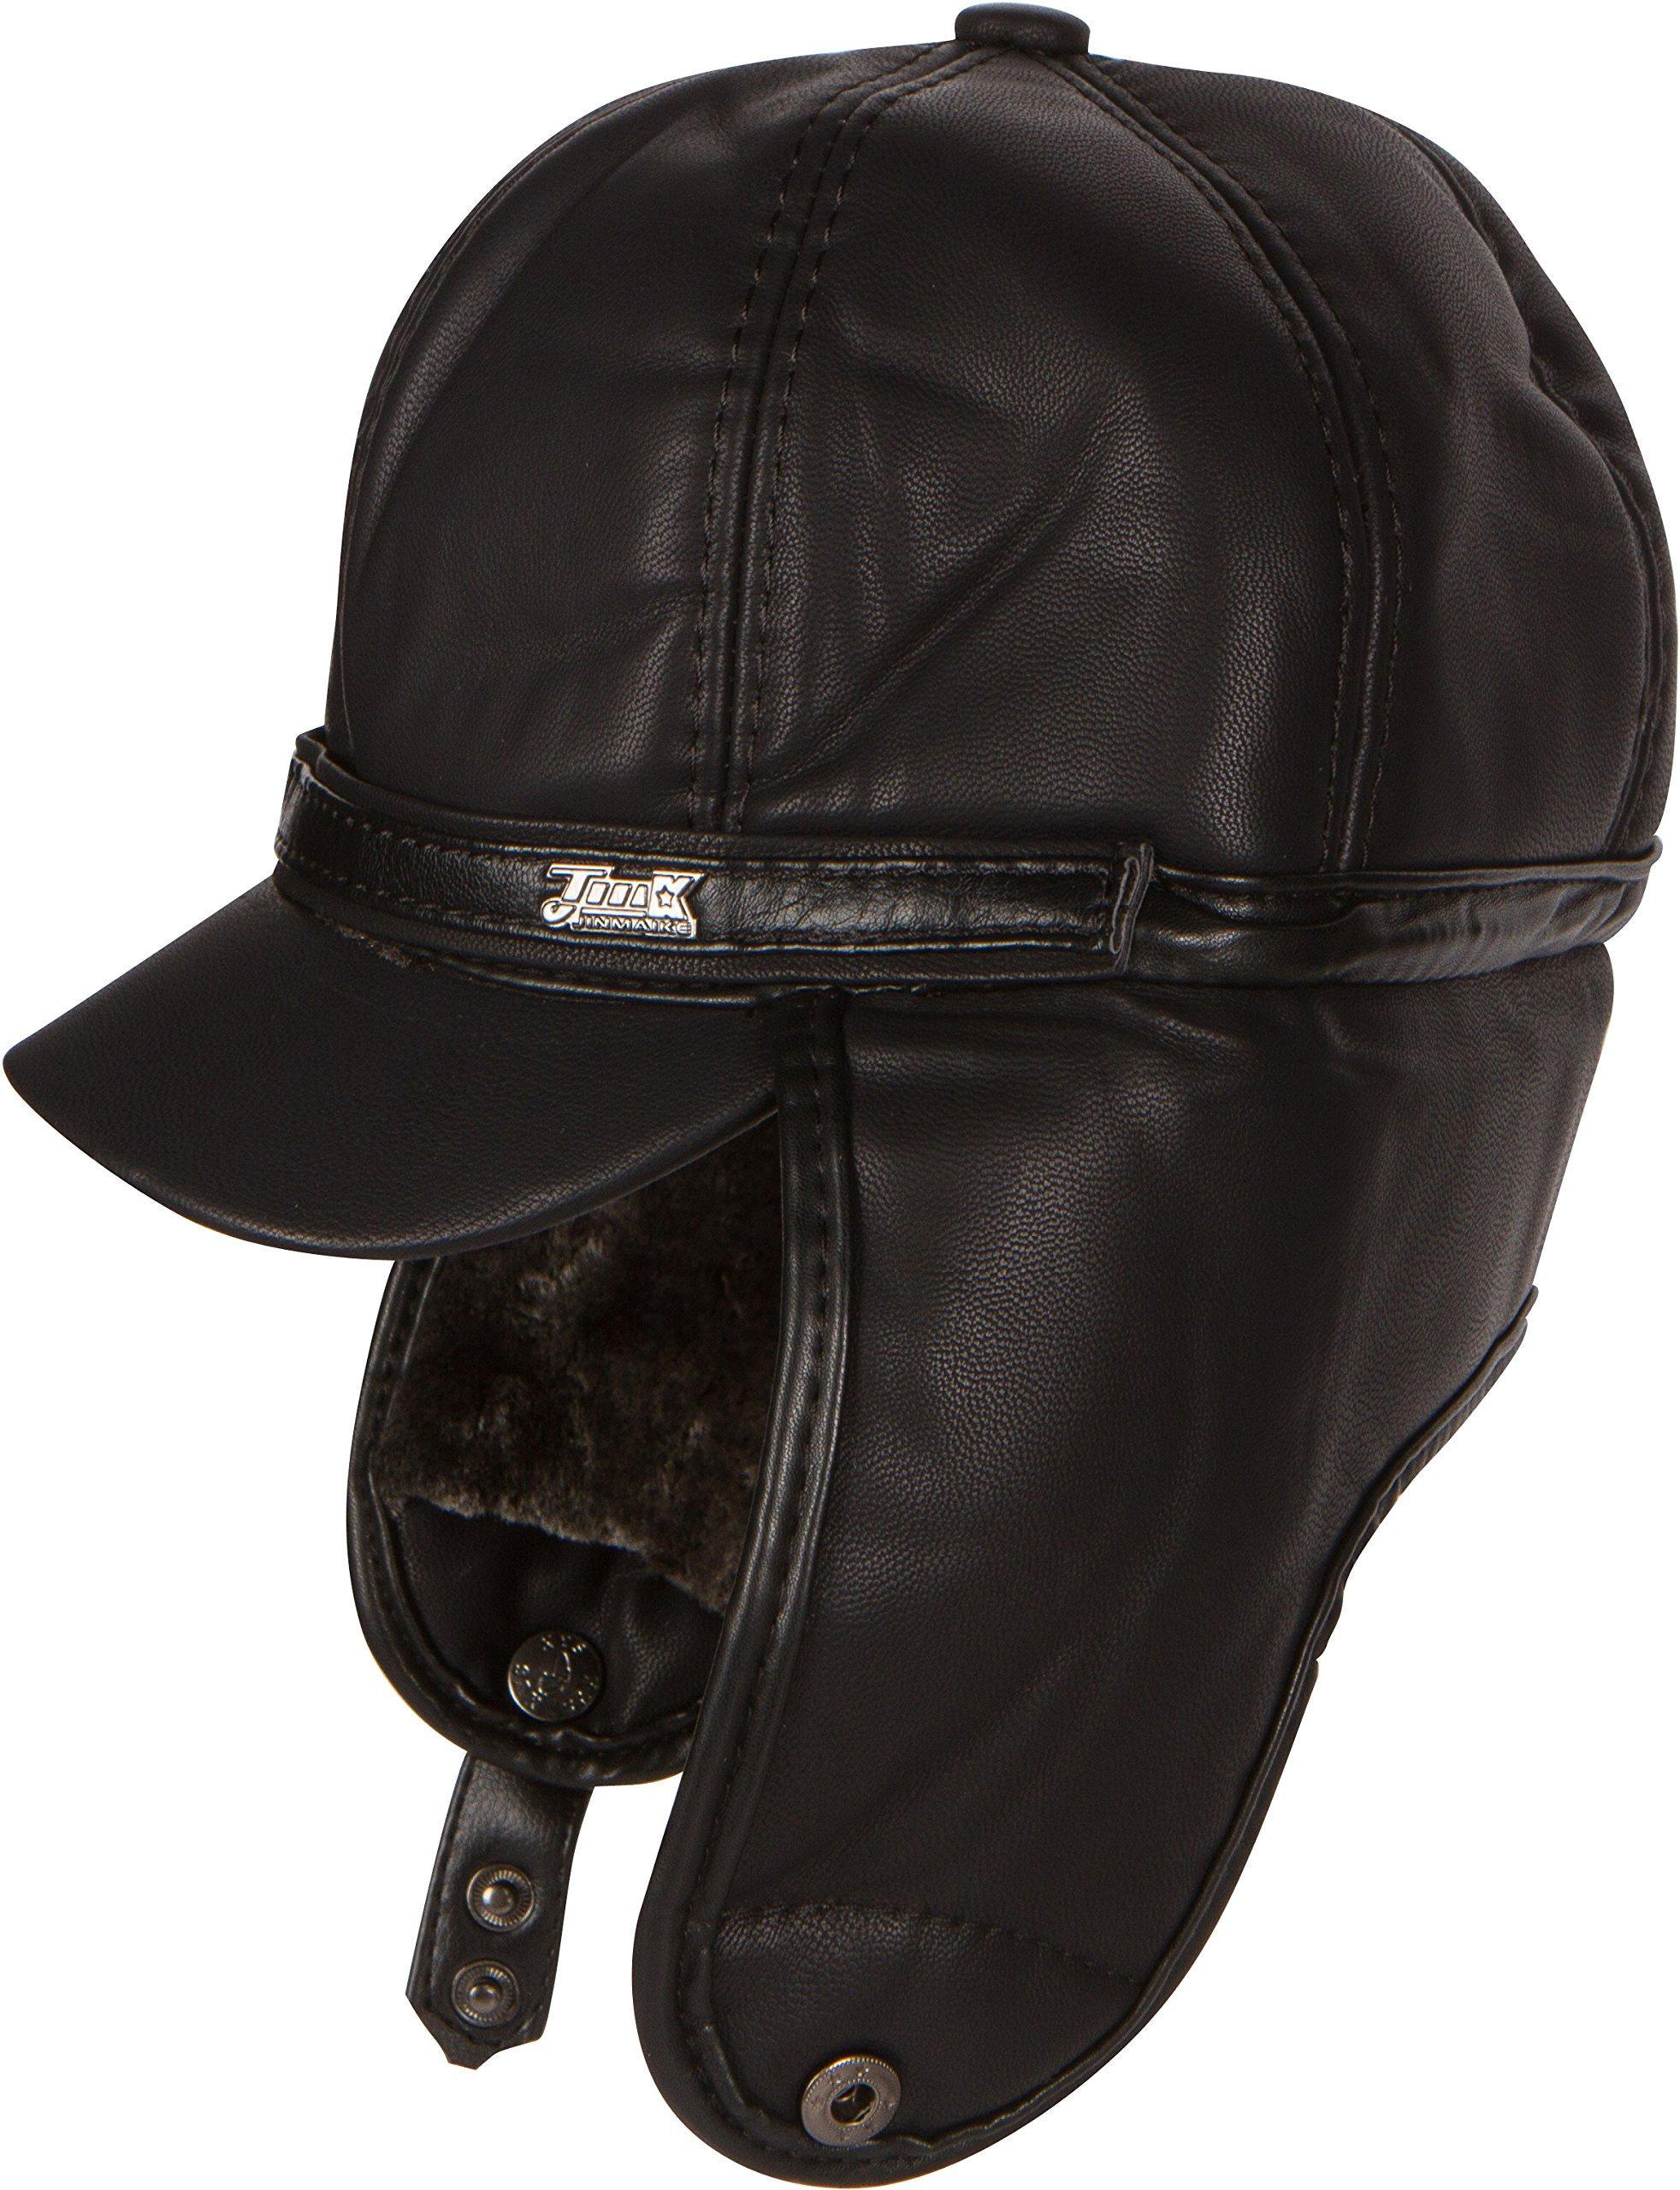 Sakkas 16158 - Leather Ushanka Faux Mink Fur Tropper Pilot Hat With Earflap - Black - L